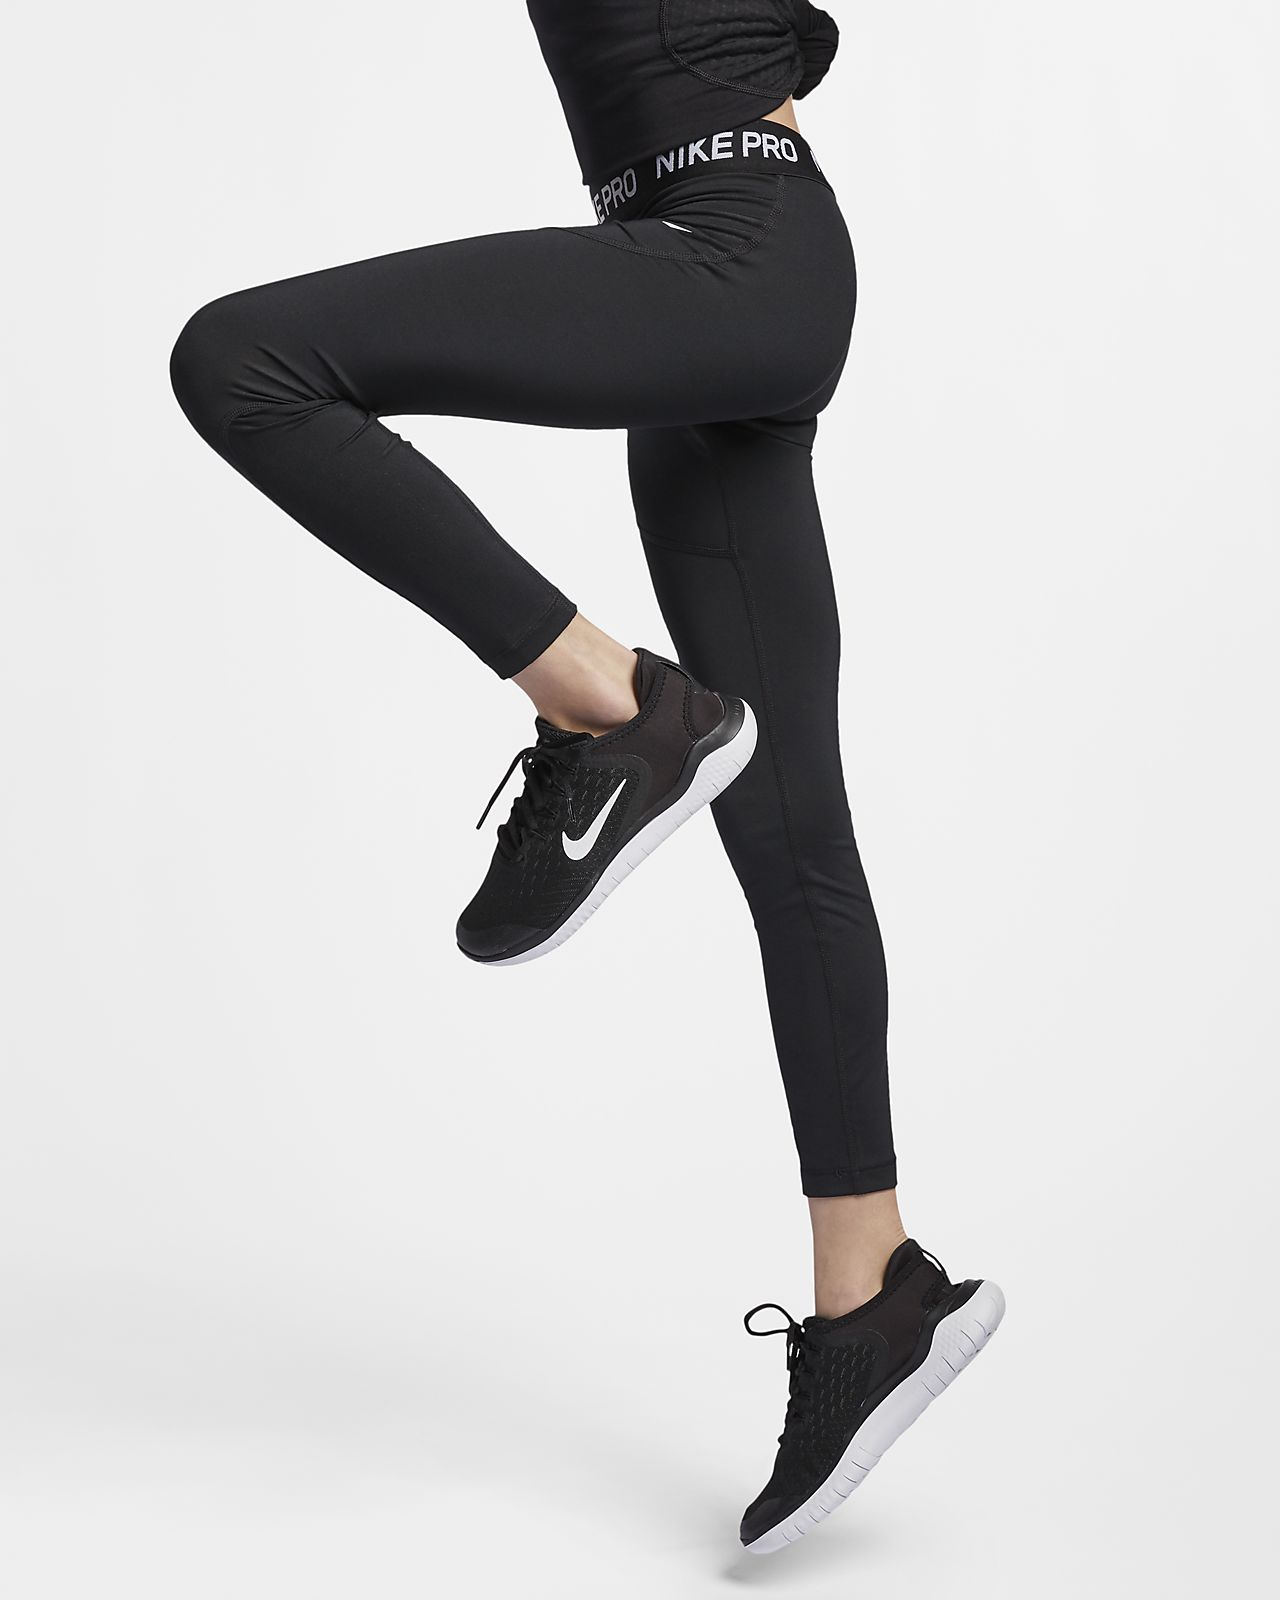 Tights Nike Pro Júnior (Rapariga)